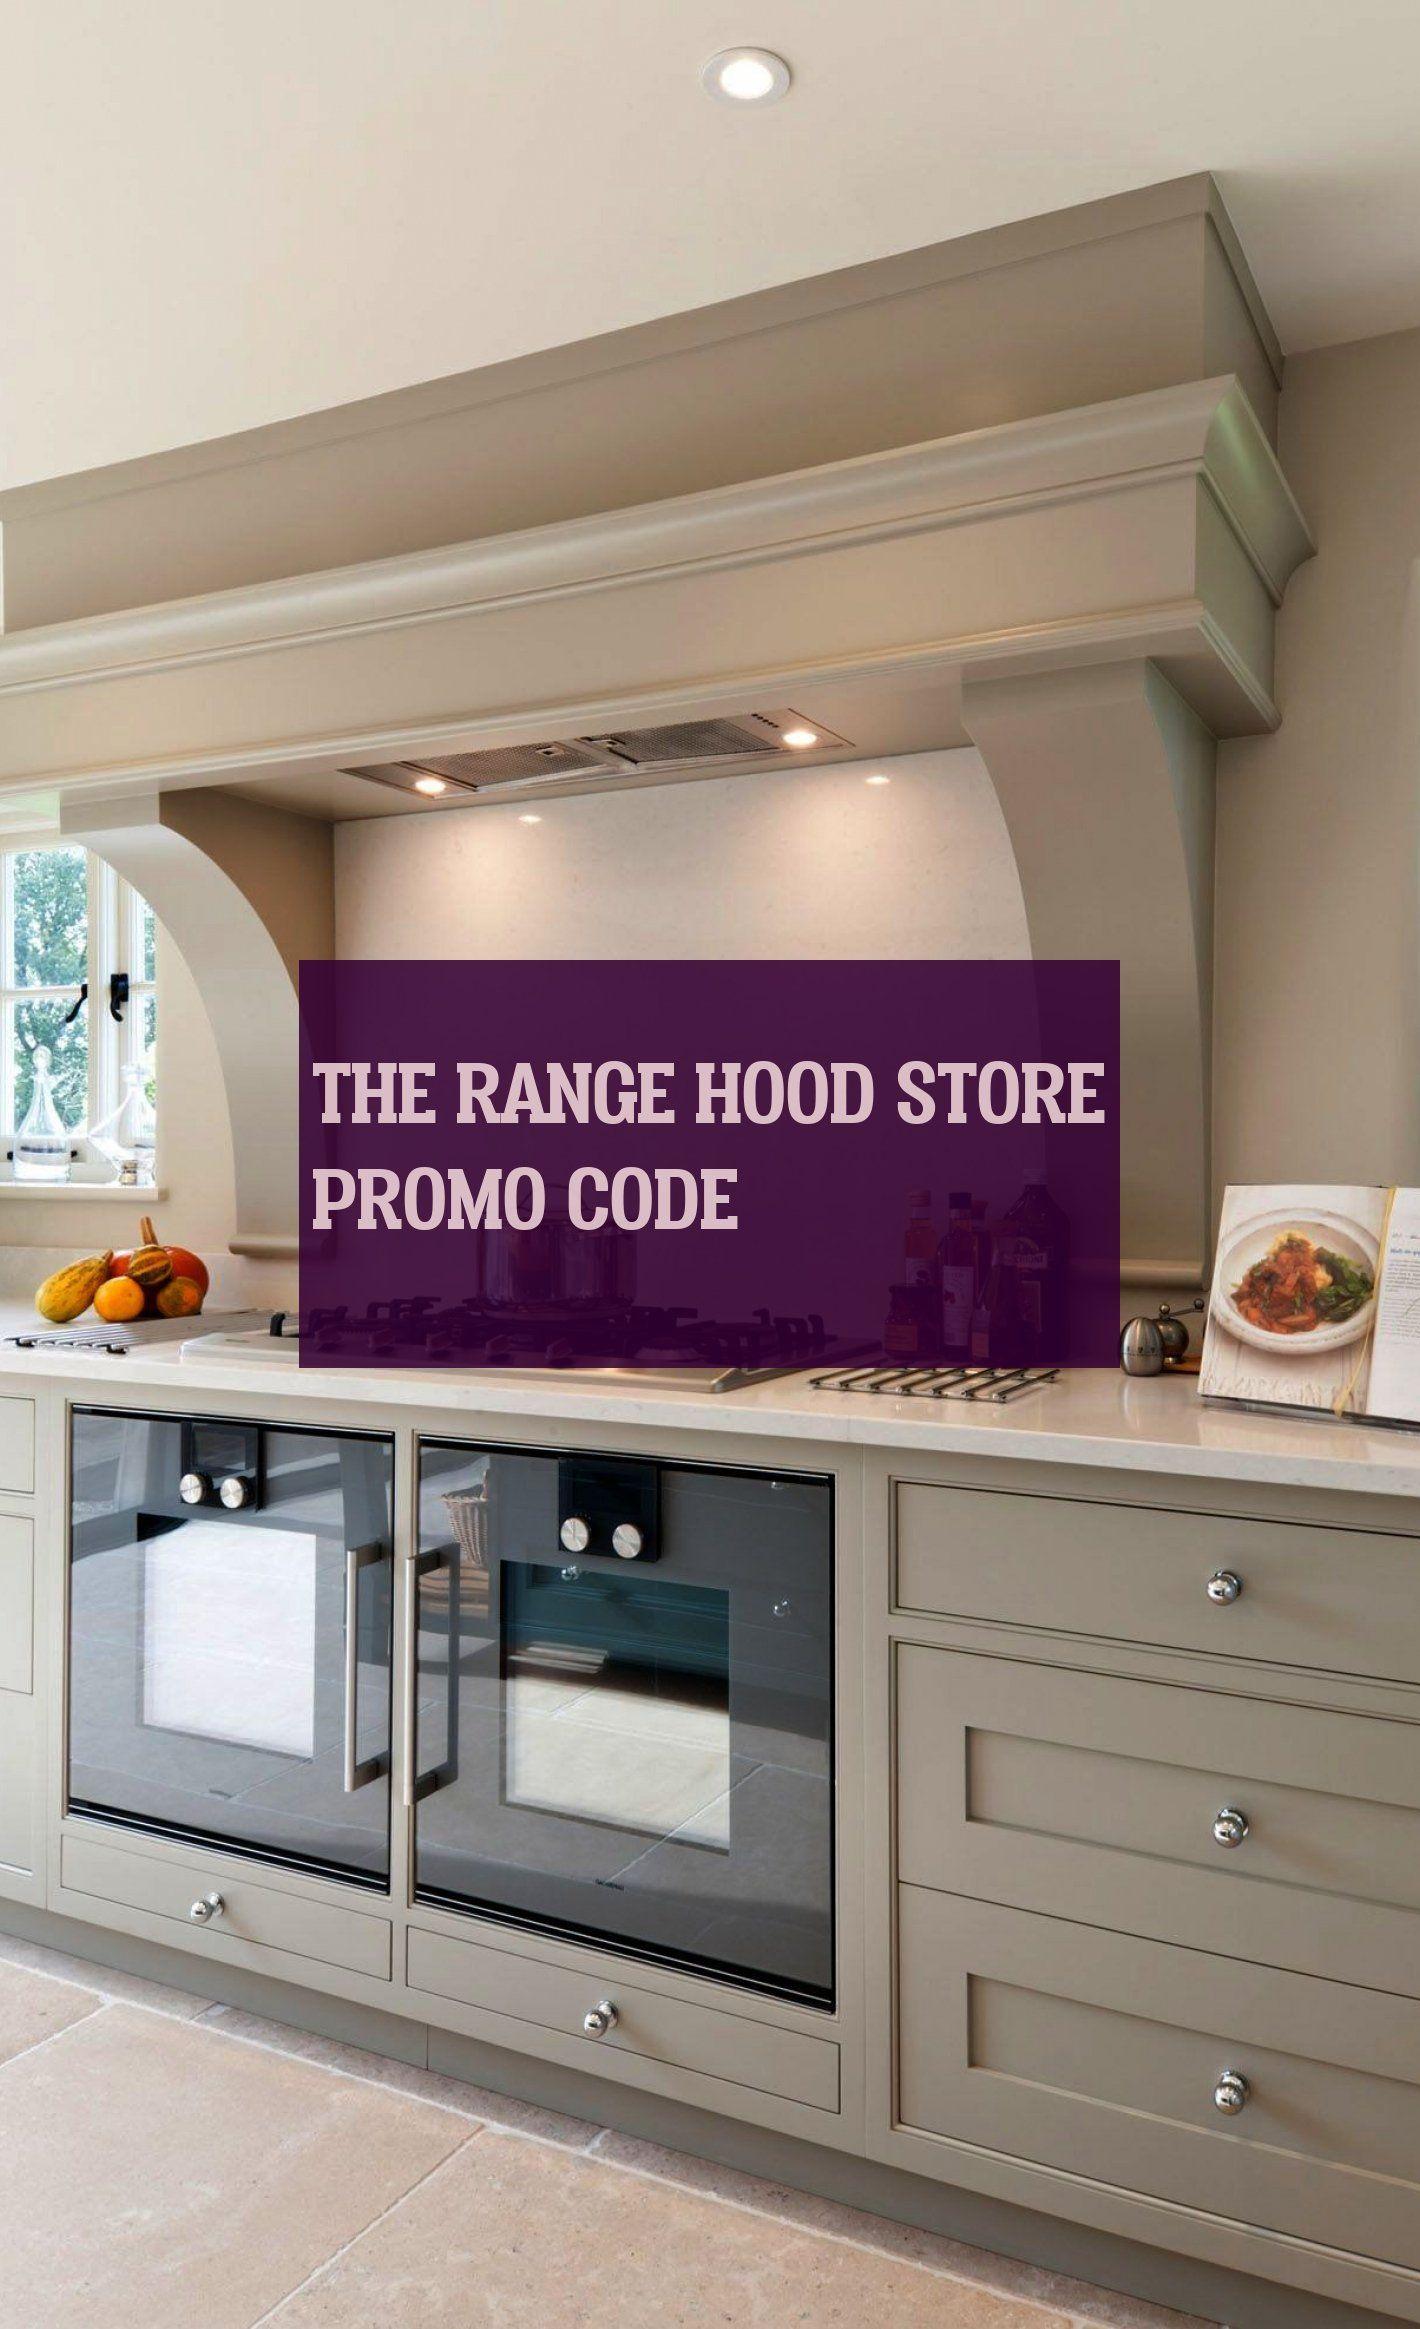 The Range Hood Store Promo Code Promo Code Fur Die Dunstabzugshaube Hooded Range Hood Store Promo Code Range Hood Kitchen Kitchen Cabinets